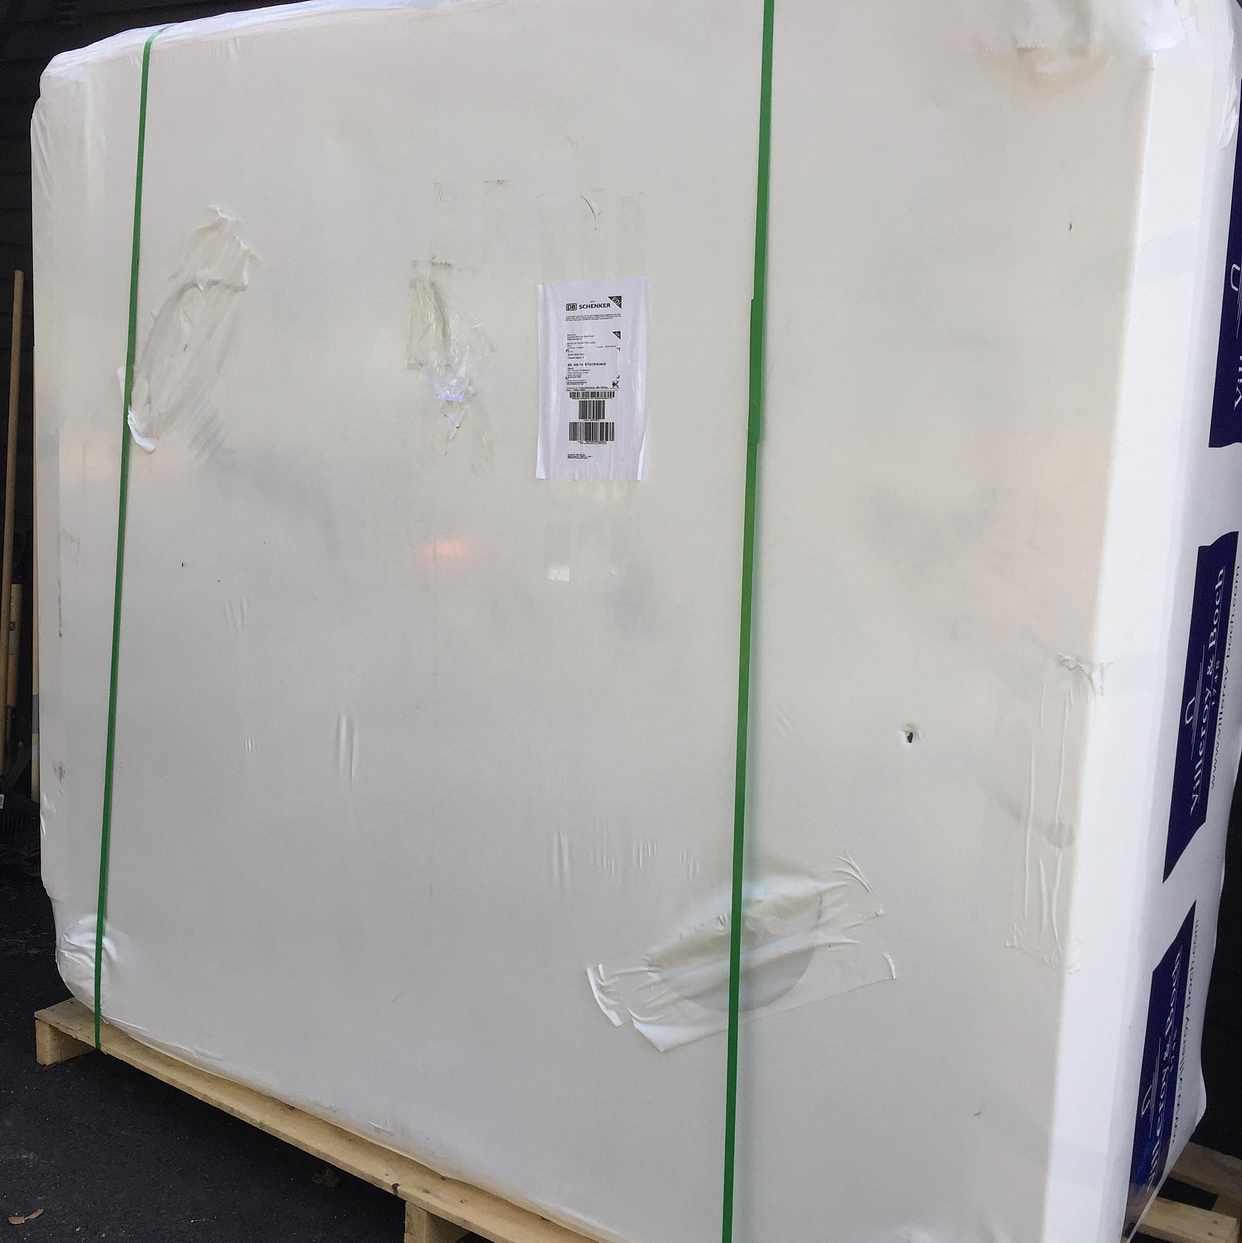 image of Bära spabad 260 kg/4 pers -